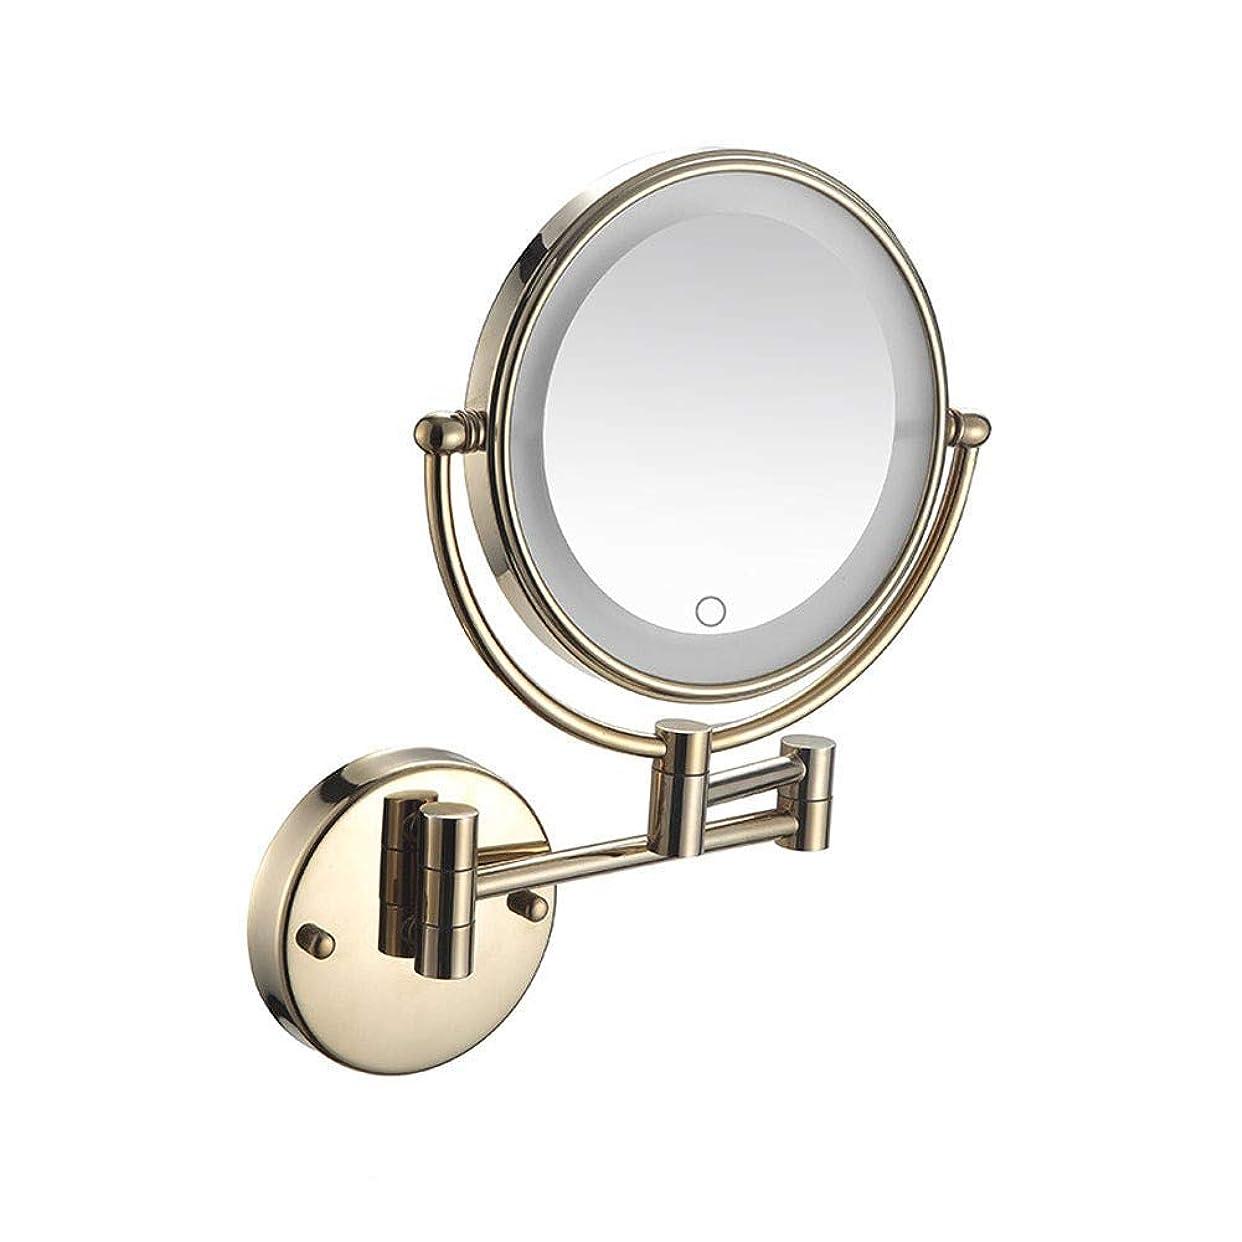 うまれた支店保護するLED浴室鏡子帶燈化妝鏡壁掛式鏡子觸摸屏5倍放大雙臂擴展雙面圓形360°旋轉壁鏡隱藏式安裝